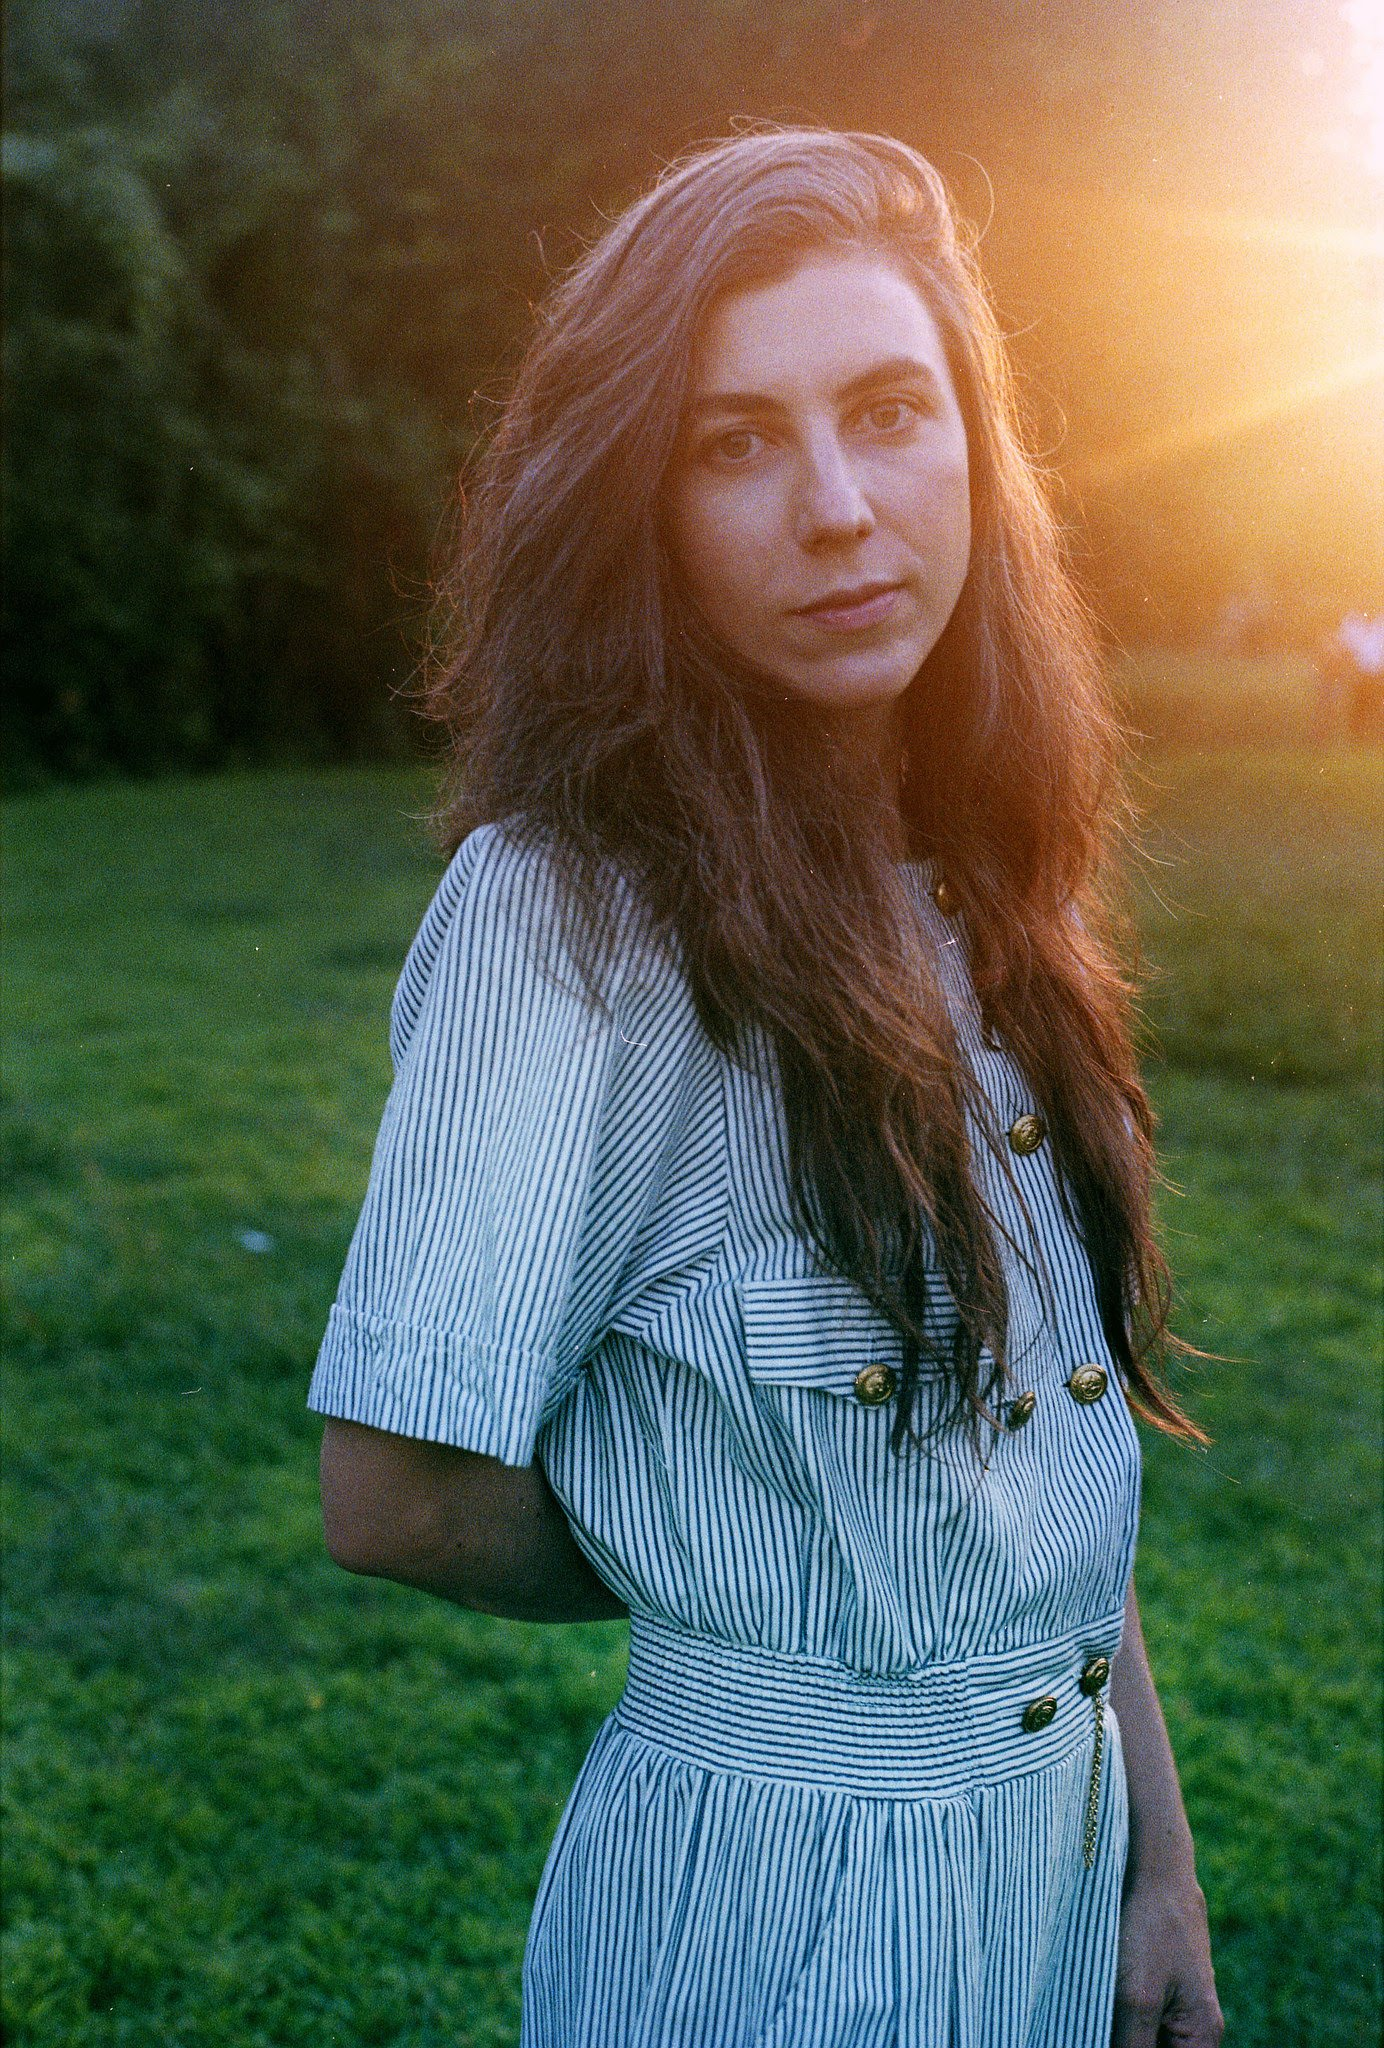 Watch @JULIA_HOLTER's video for captivating new single 'Words I Heard' https://t.co/Iy5QC5mkCJ https://t.co/kjTvRLpIW2